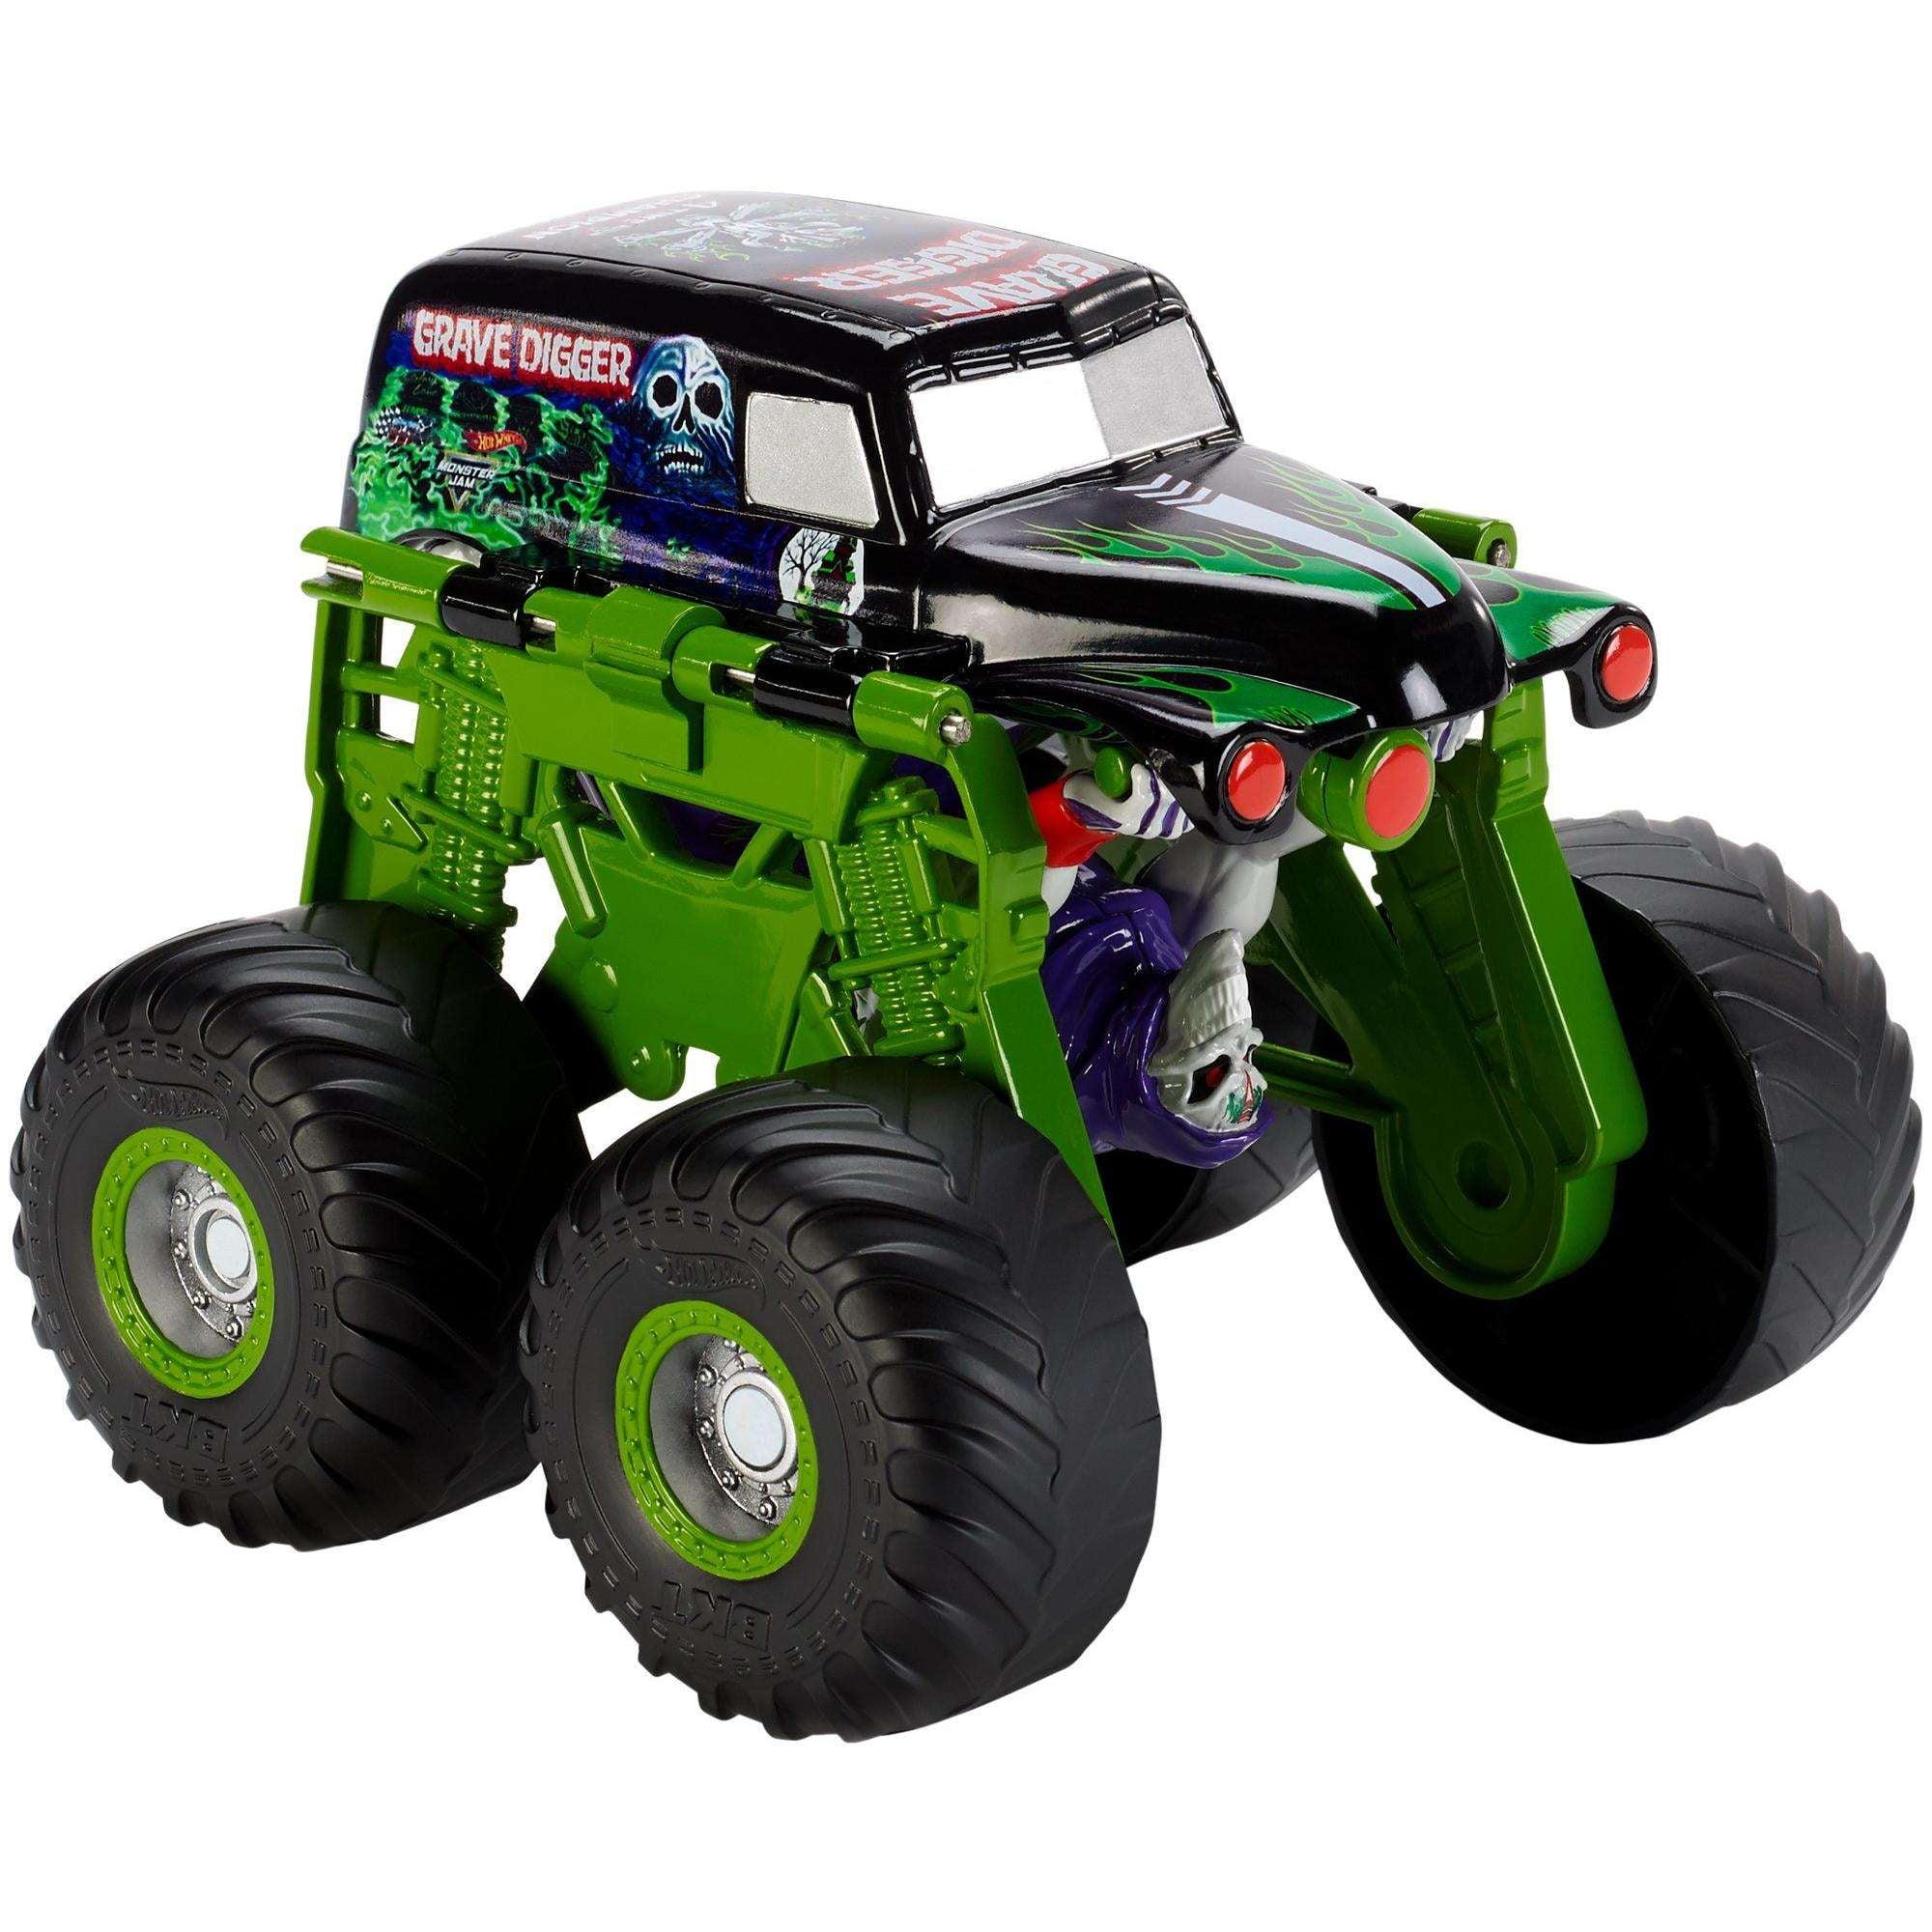 Hot Wheels Monster Jam Monster Morphers Grave Digger Vehicle by Mattel